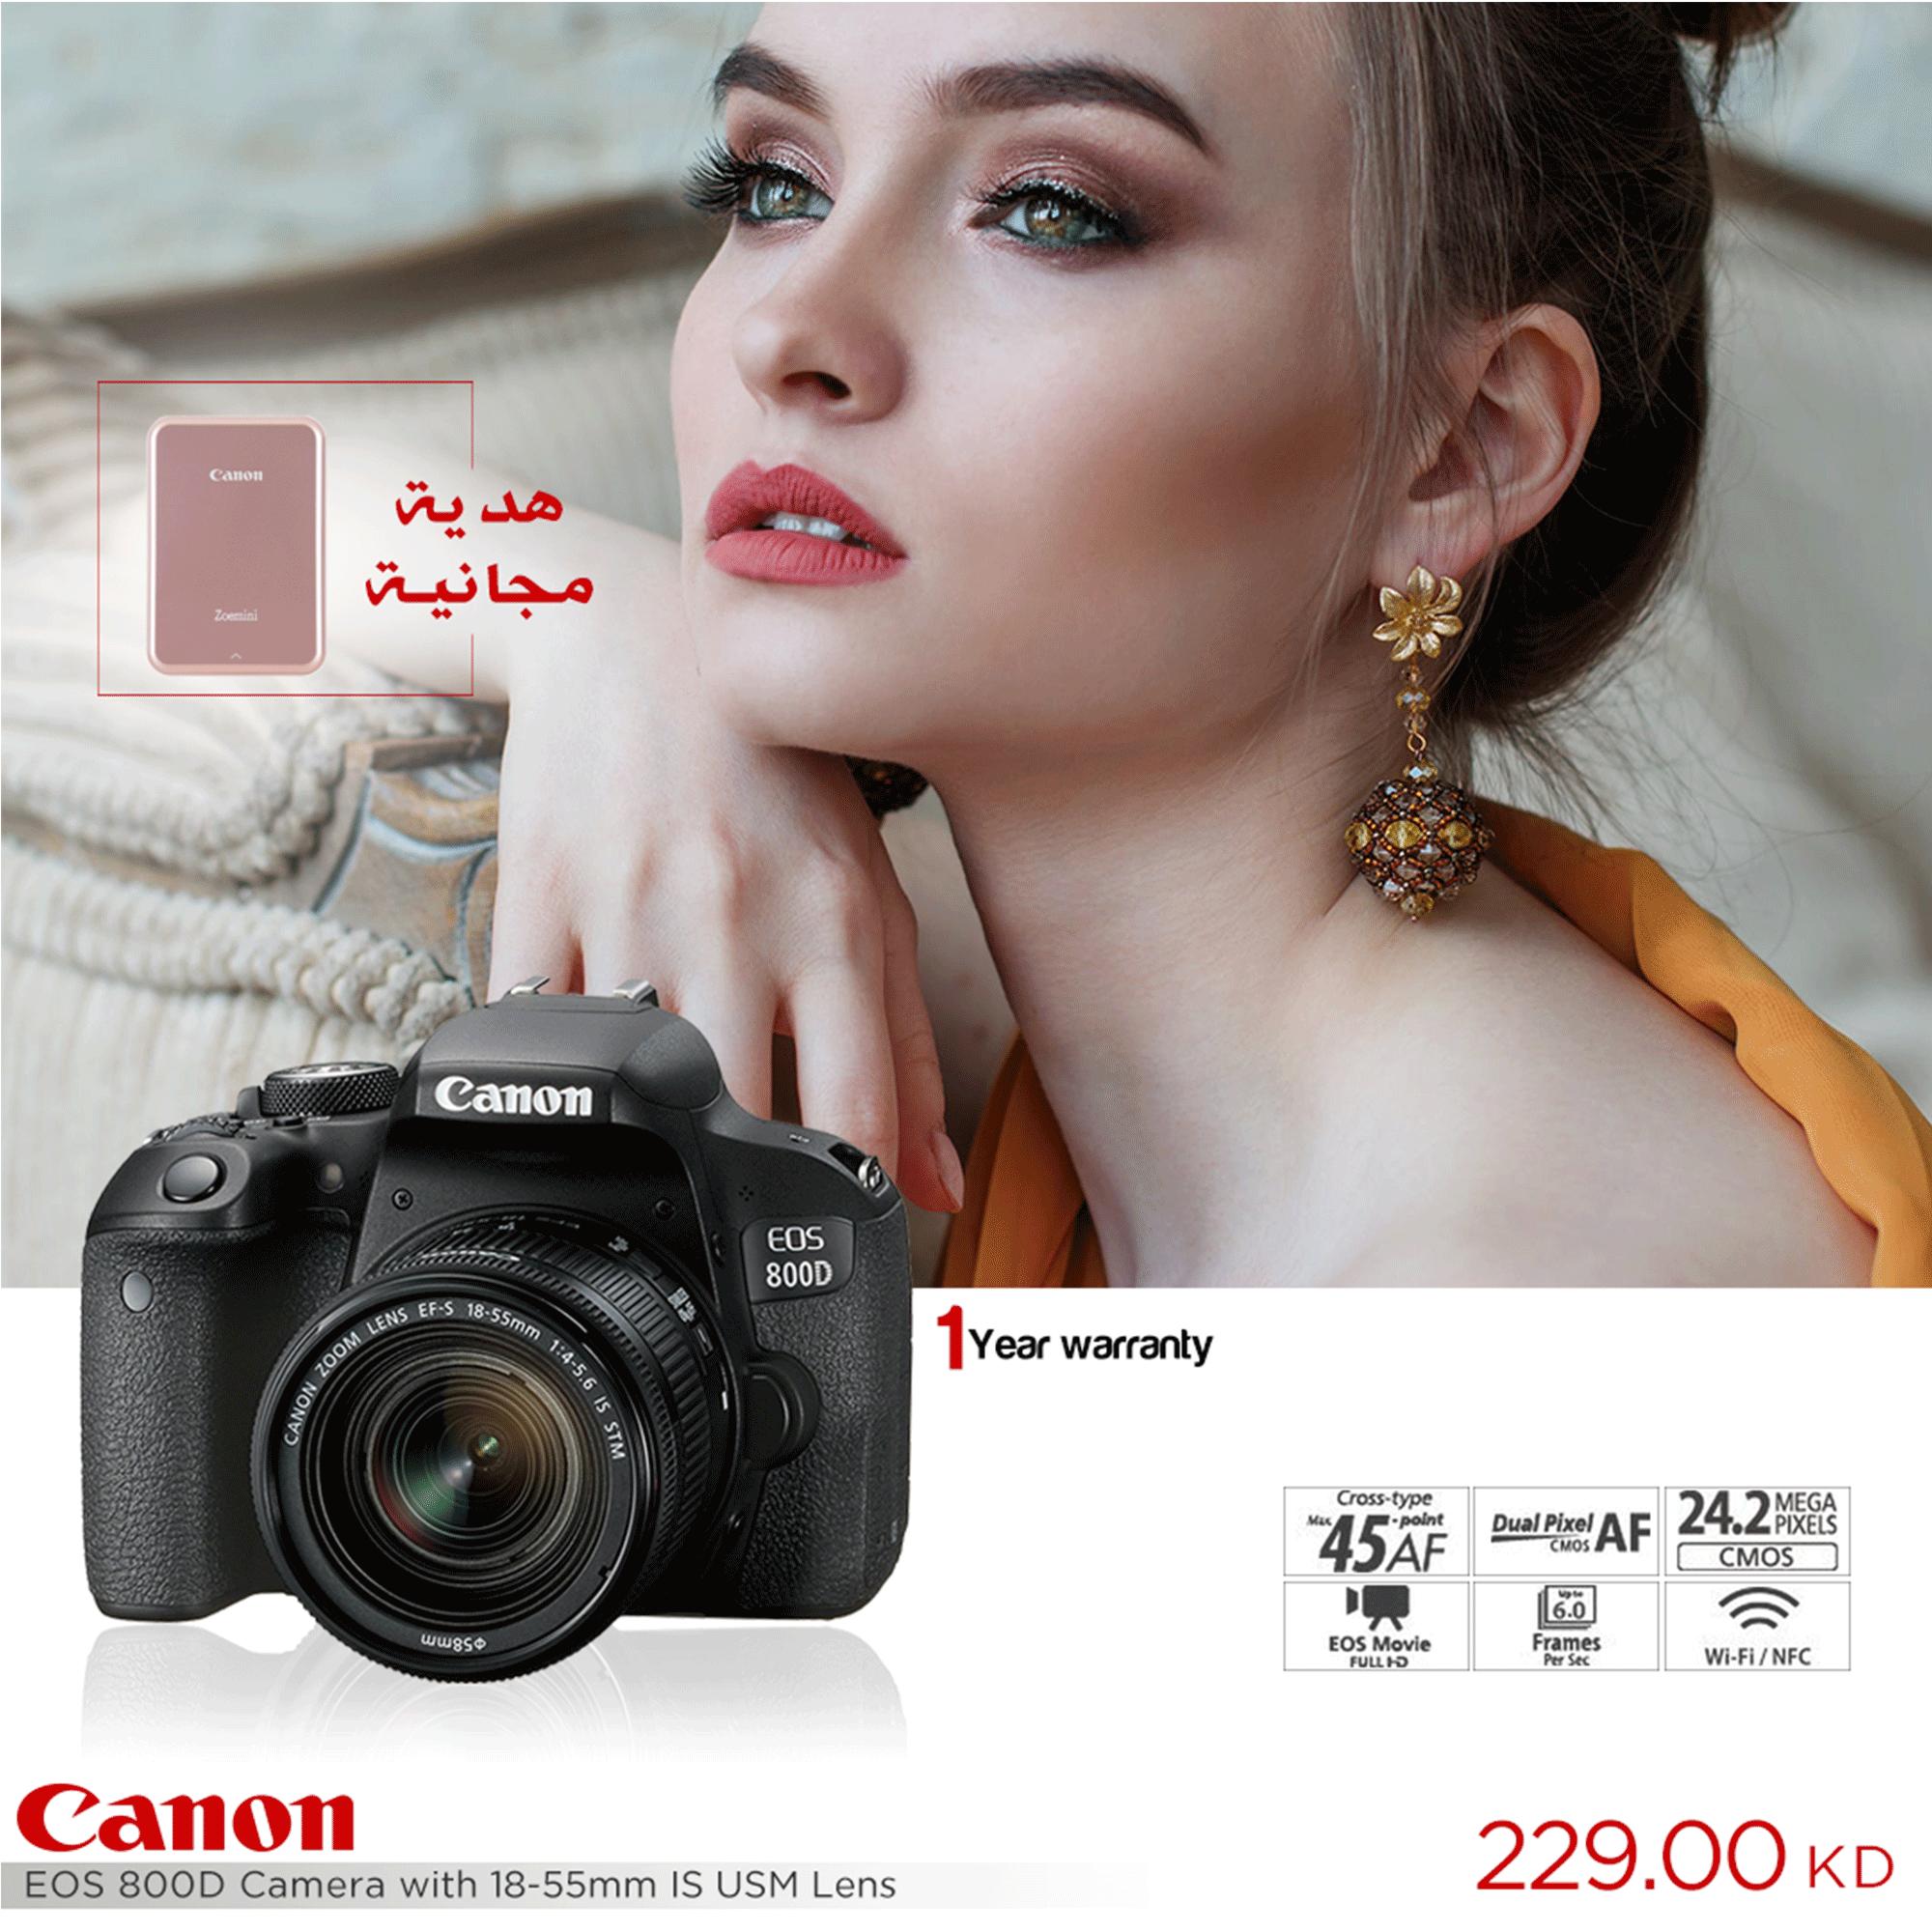 CANON EOS 800D DSLR CAMERA WITH 18-55MM LENS + FREE canon Zoemini Printer